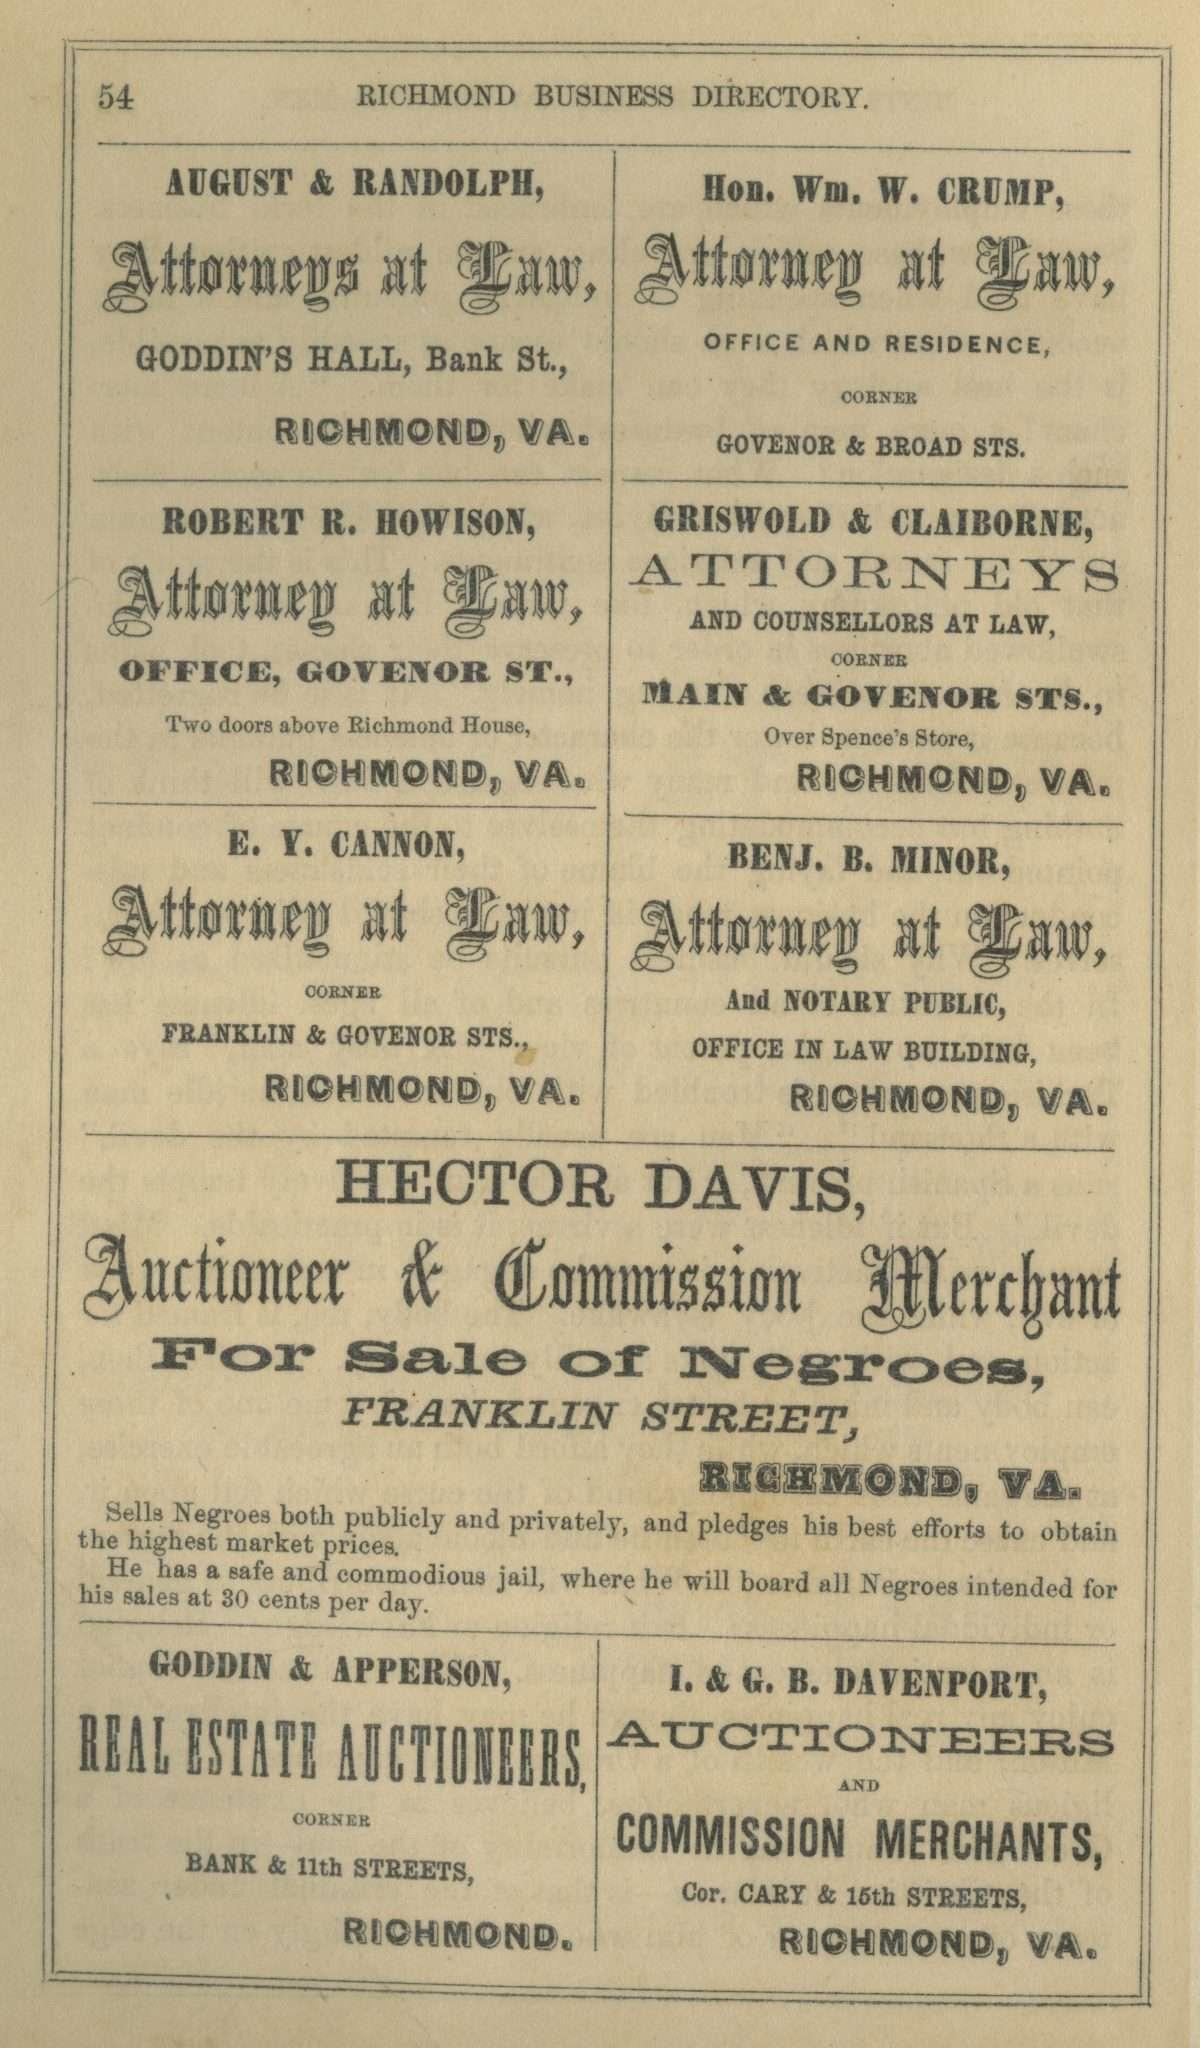 Hector Davis's Slave Business